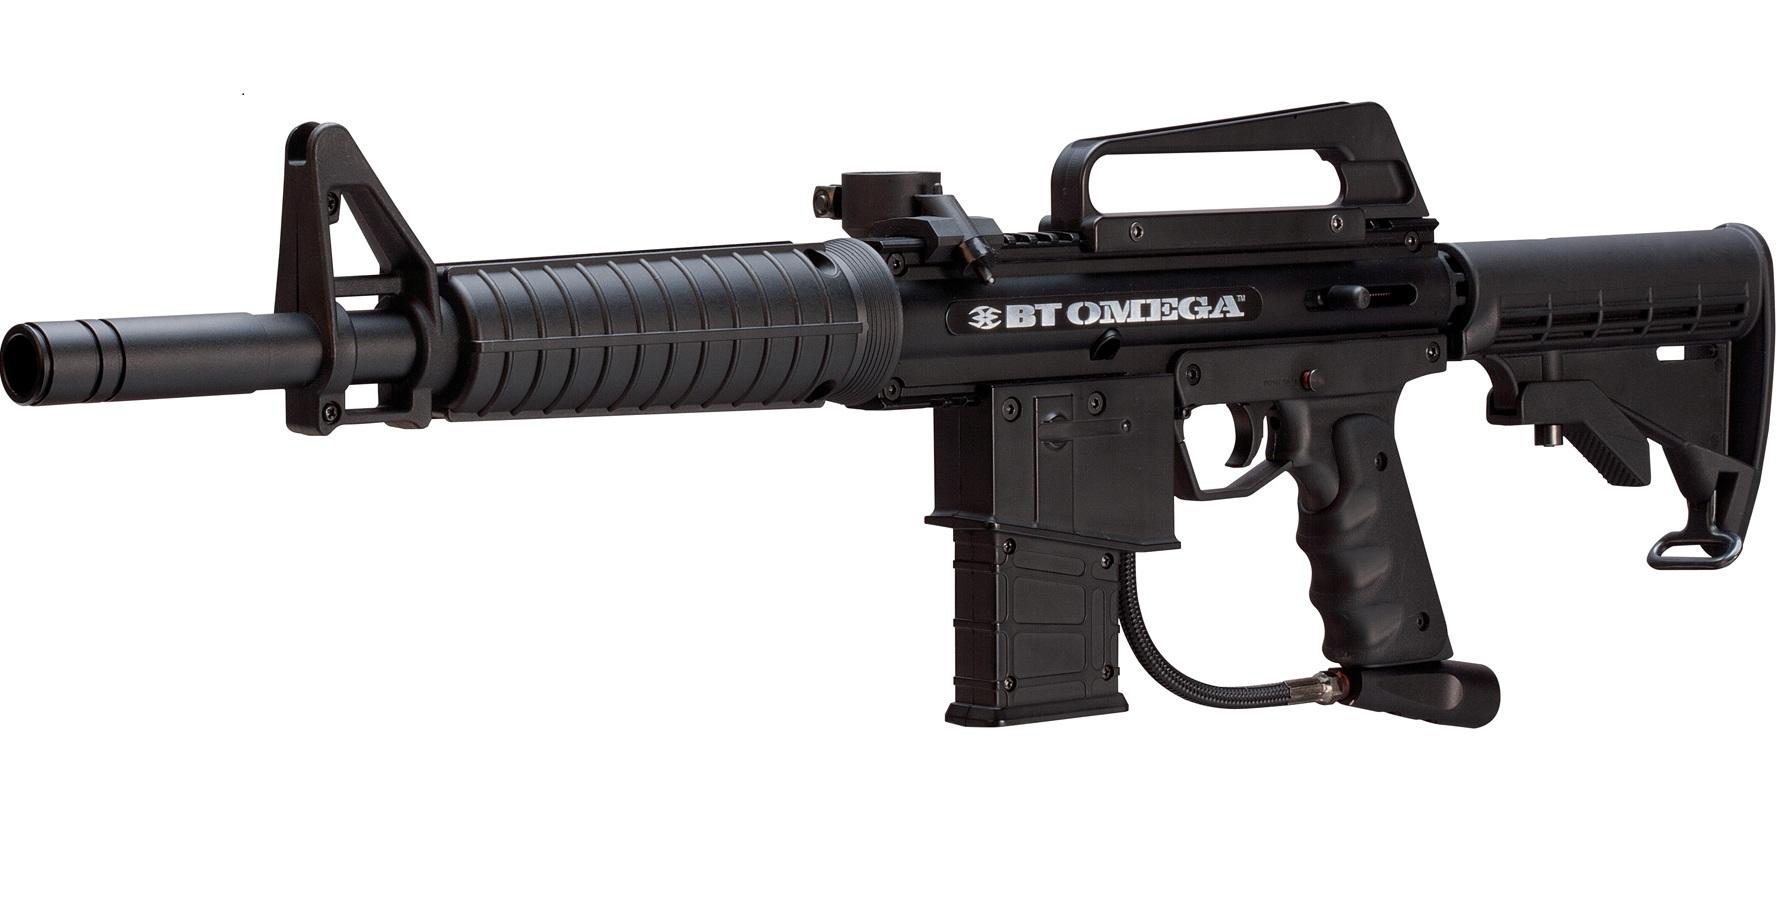 Paintball guns that look like real guns